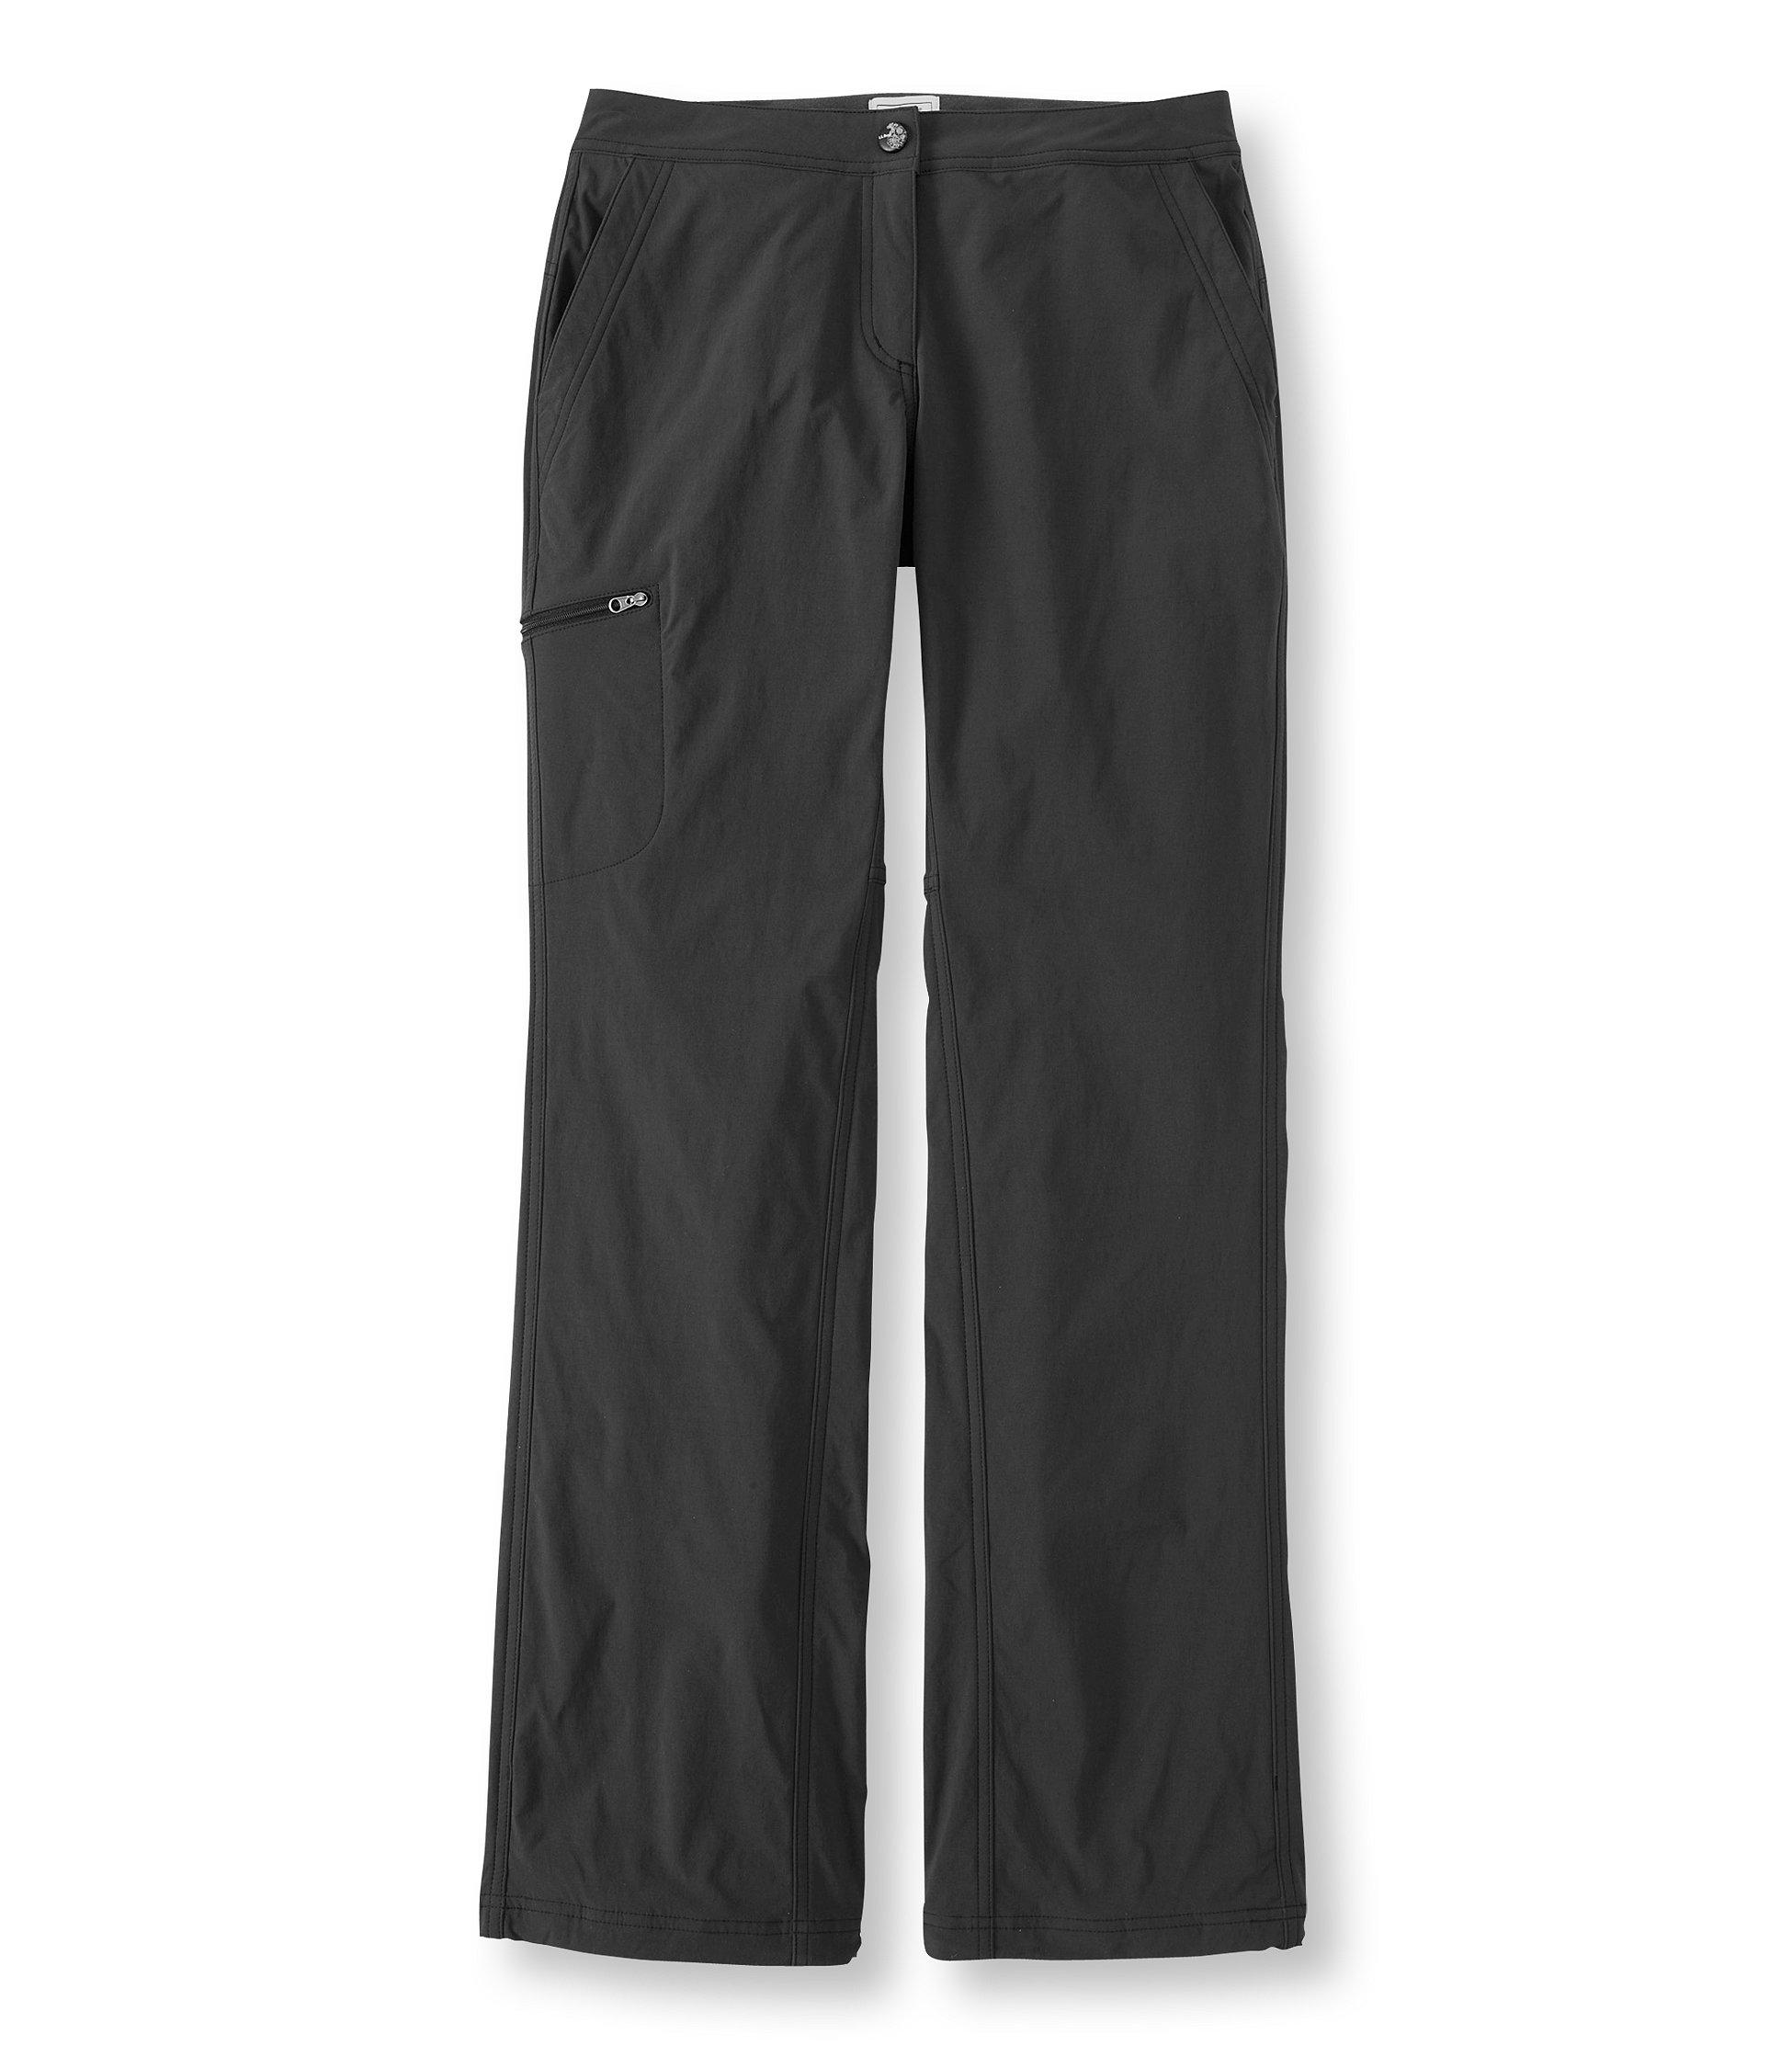 L.L.Bean Comfort Trail Pants, Lined